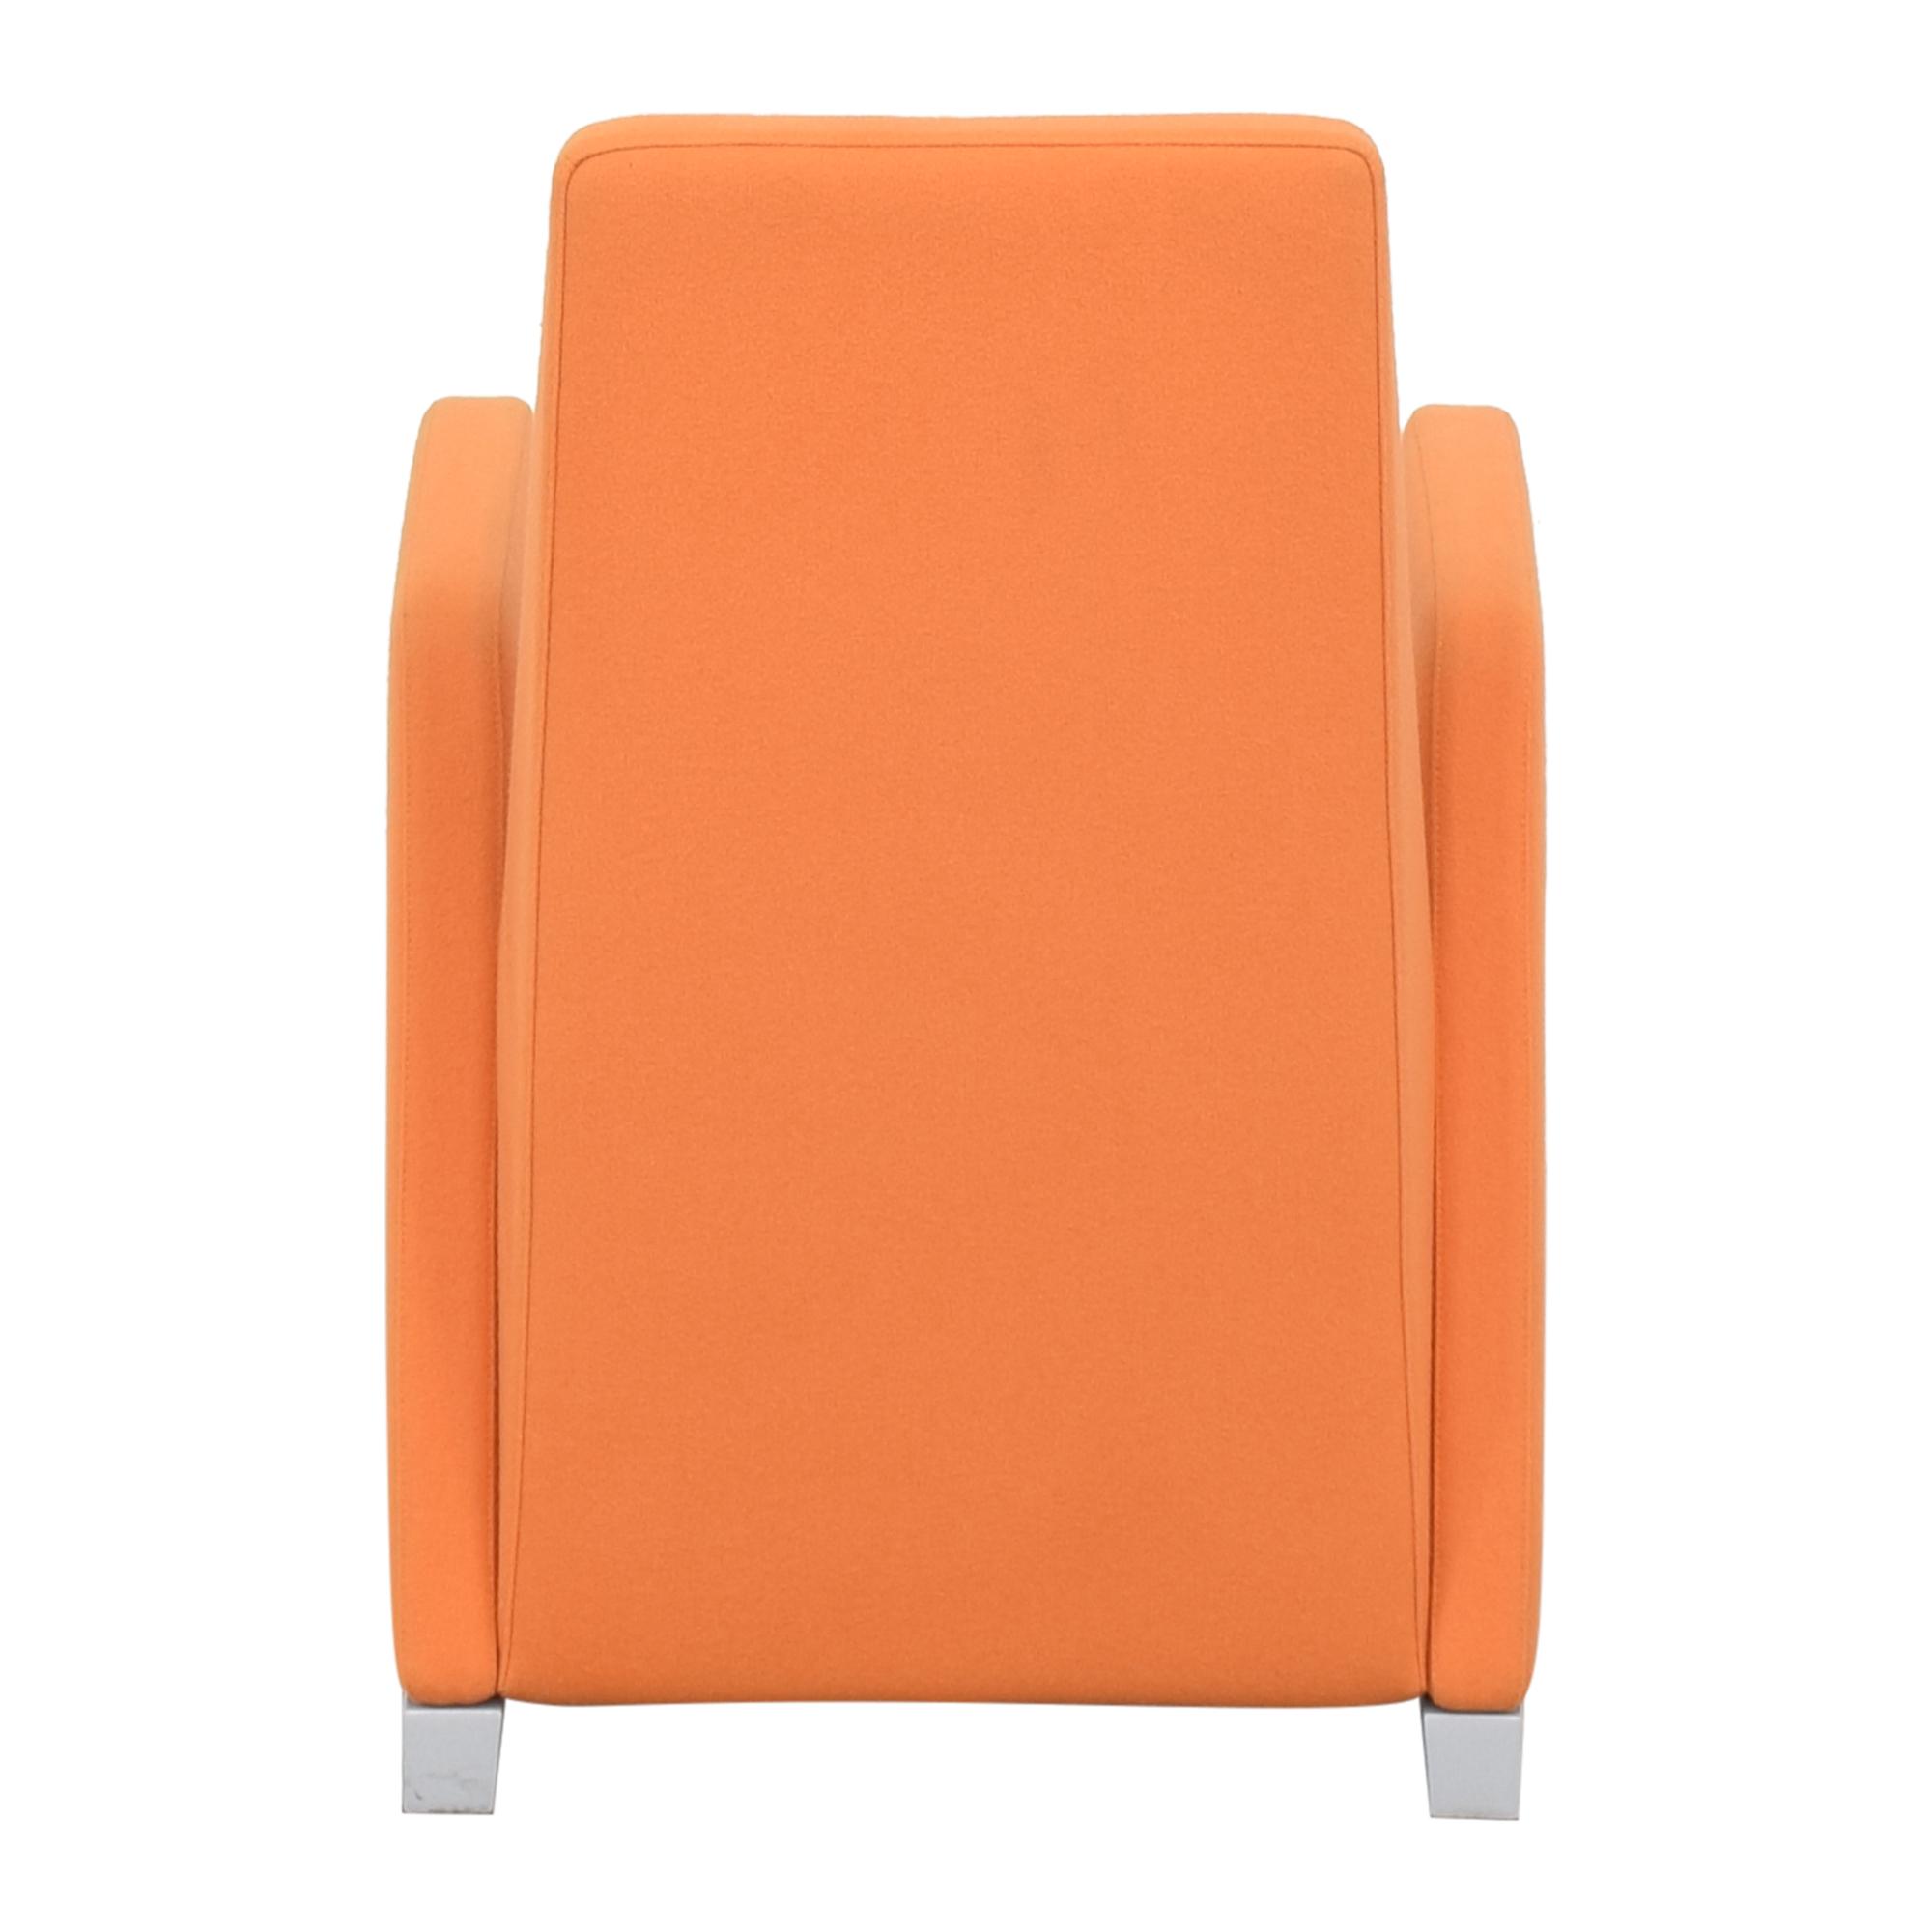 shop Baleri Italia Tato Orange Chair Baleri Italia Accent Chairs